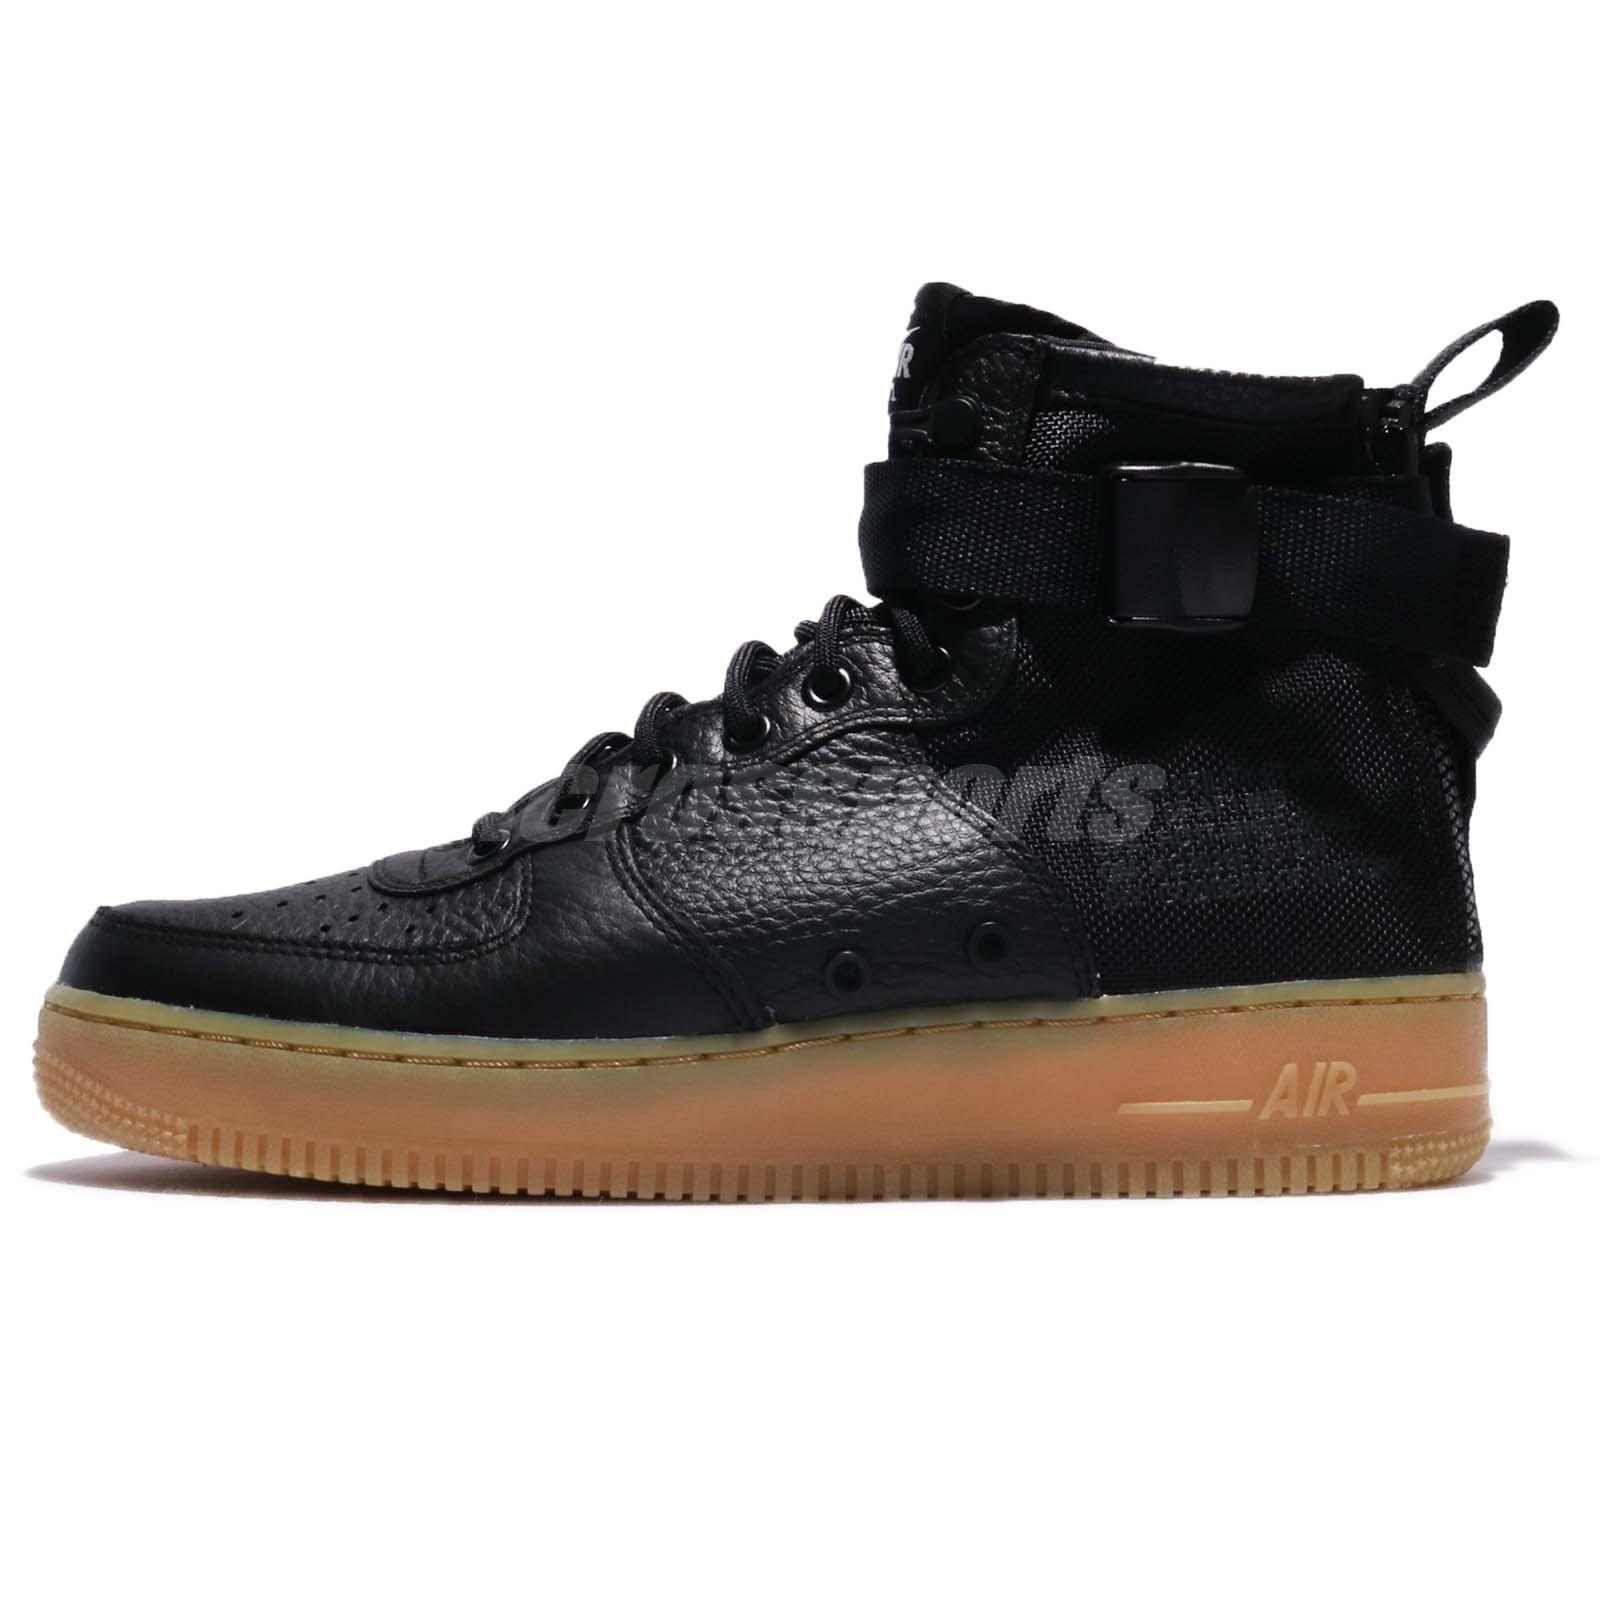 870f7474783dd5 Nike SF AF1 Mid Special Field Black Gum Light Brown Men Air Force 1  917753-003